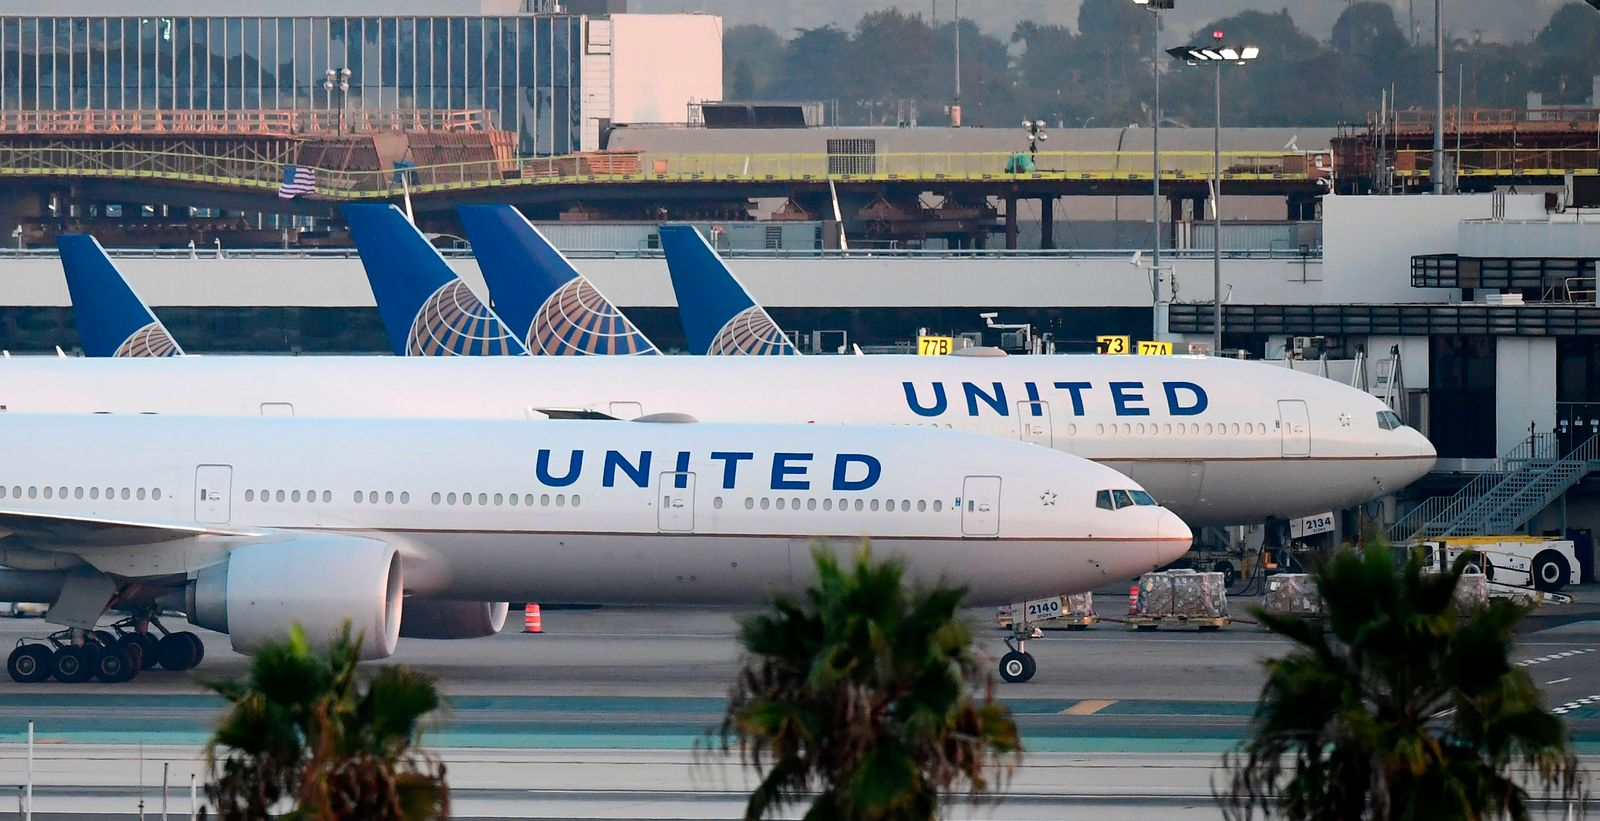 FILES-US-AIRLINE-EARNINGS-HEALTH-VIRUS-UNITED